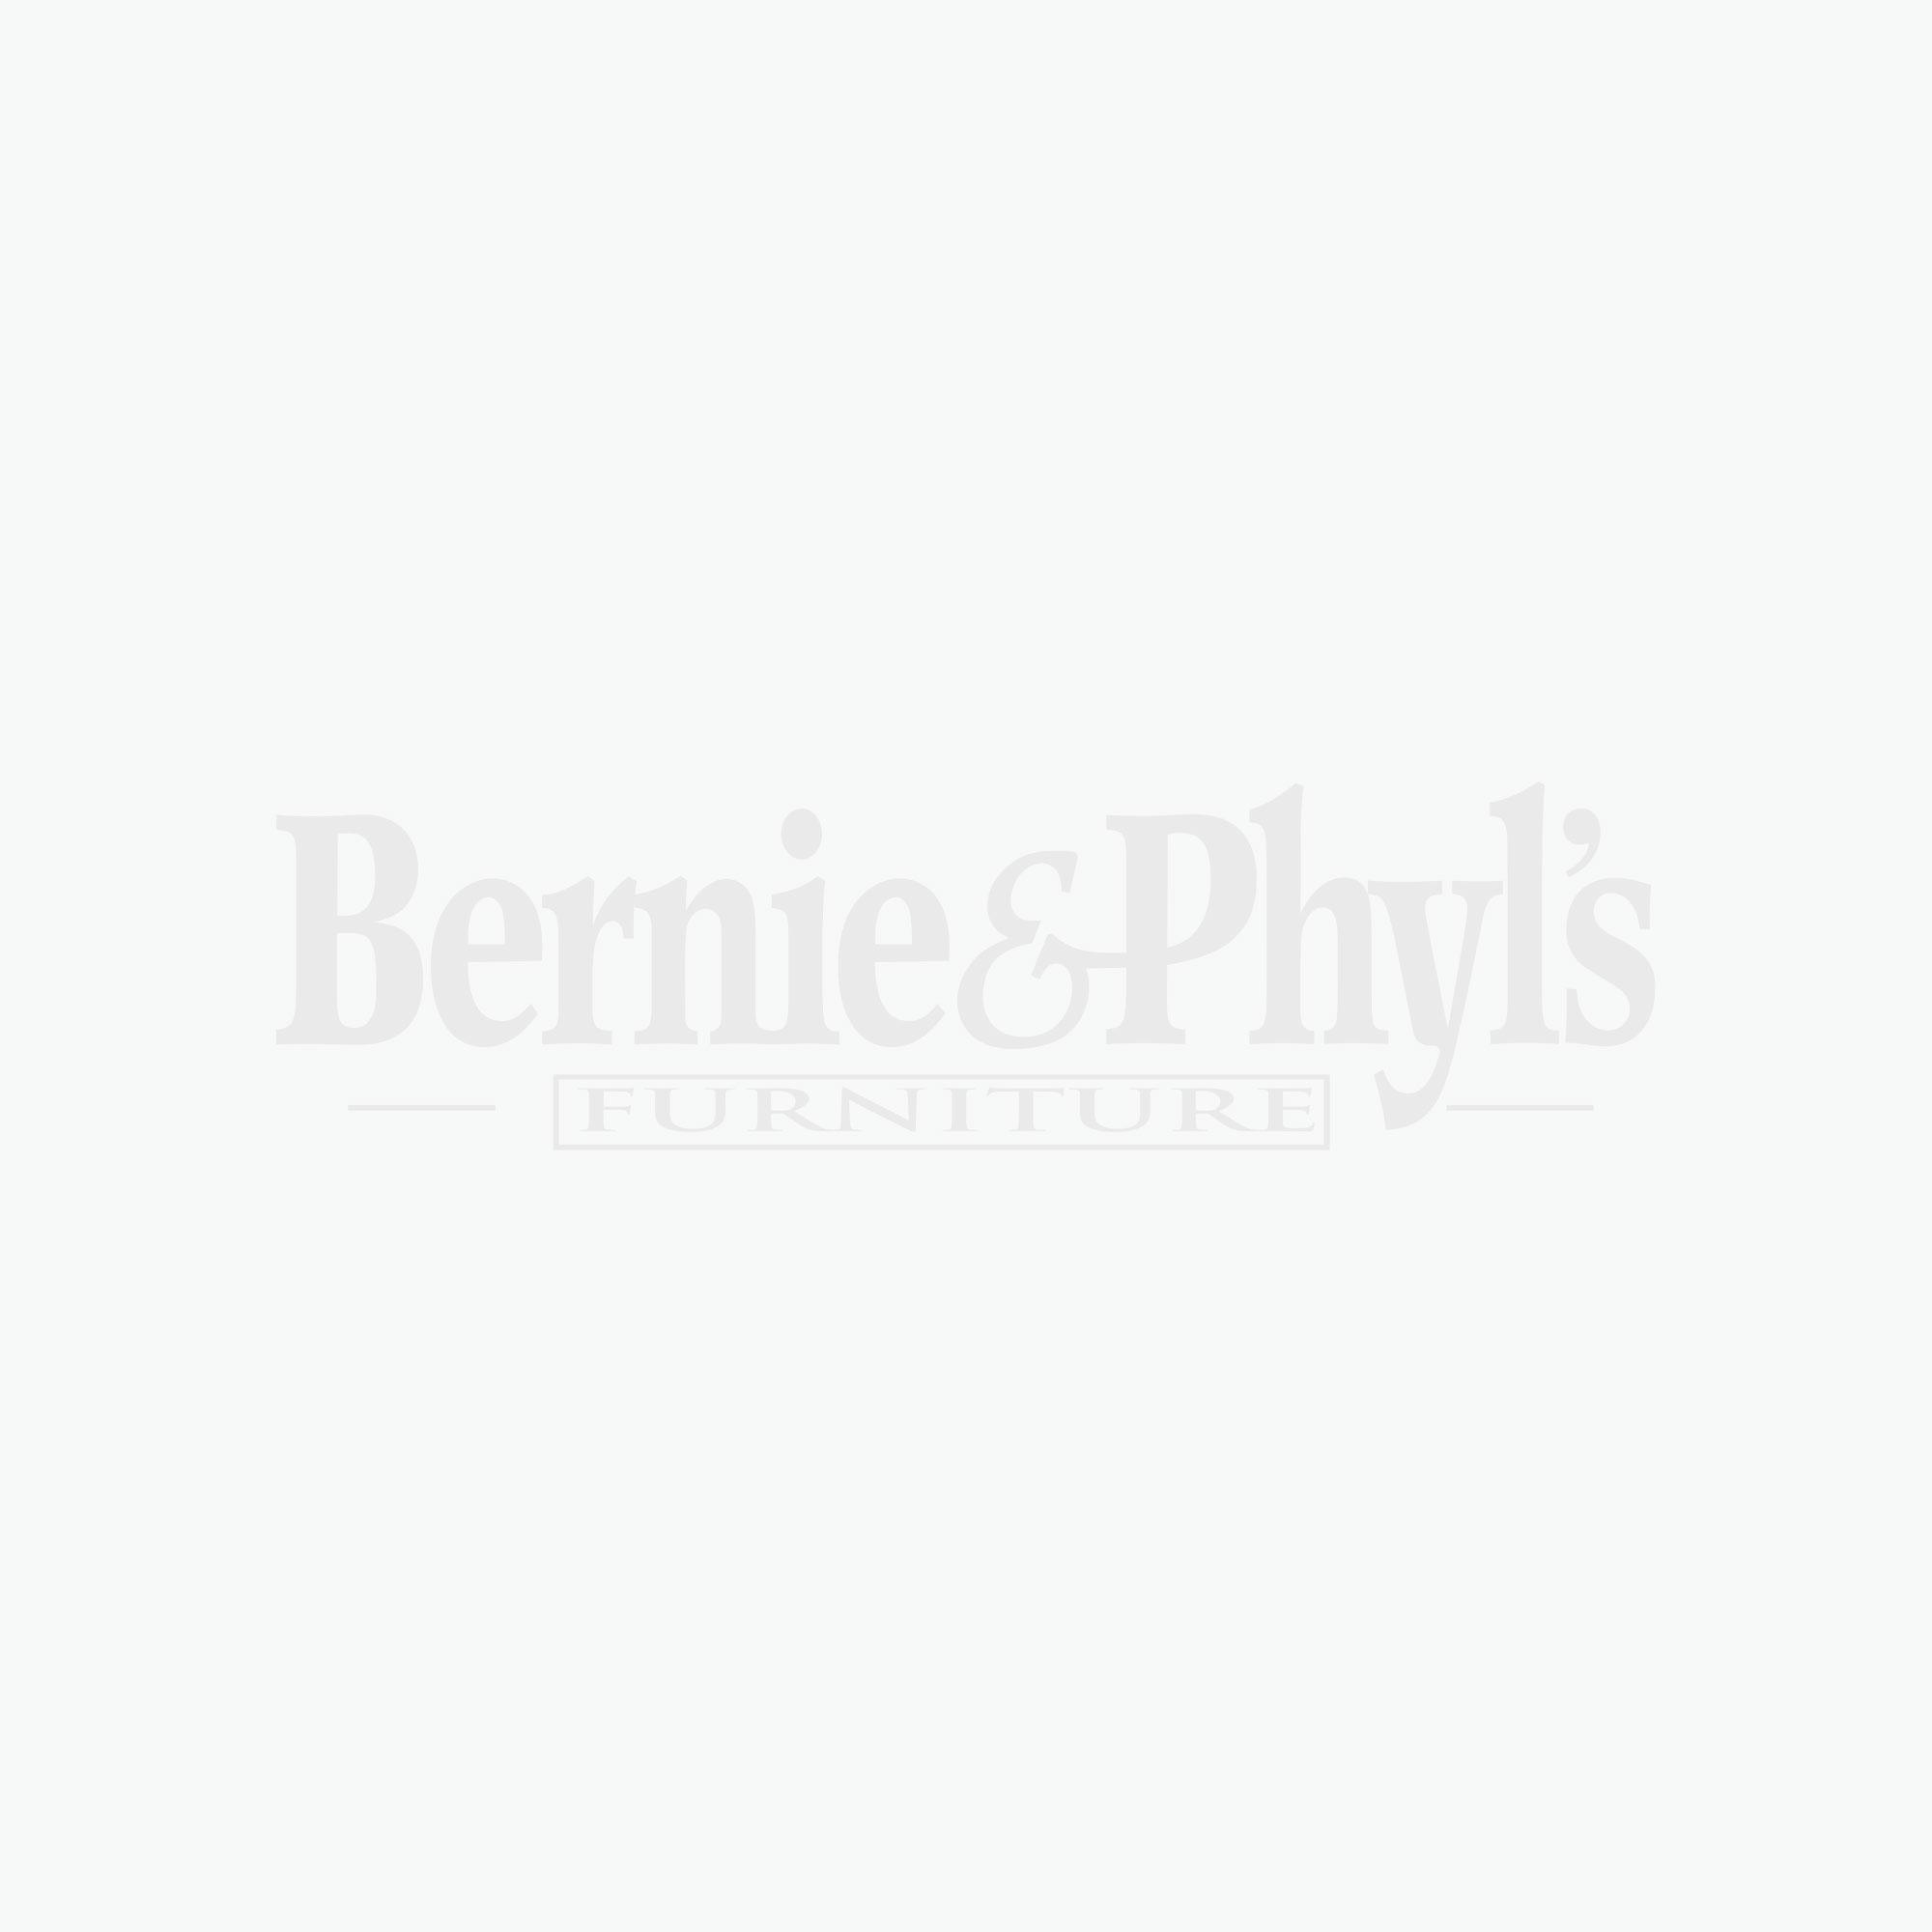 Kentwood Nightstand Nightstands Bedroom Bernie Phyl S Furniture By Magnussen Furniture